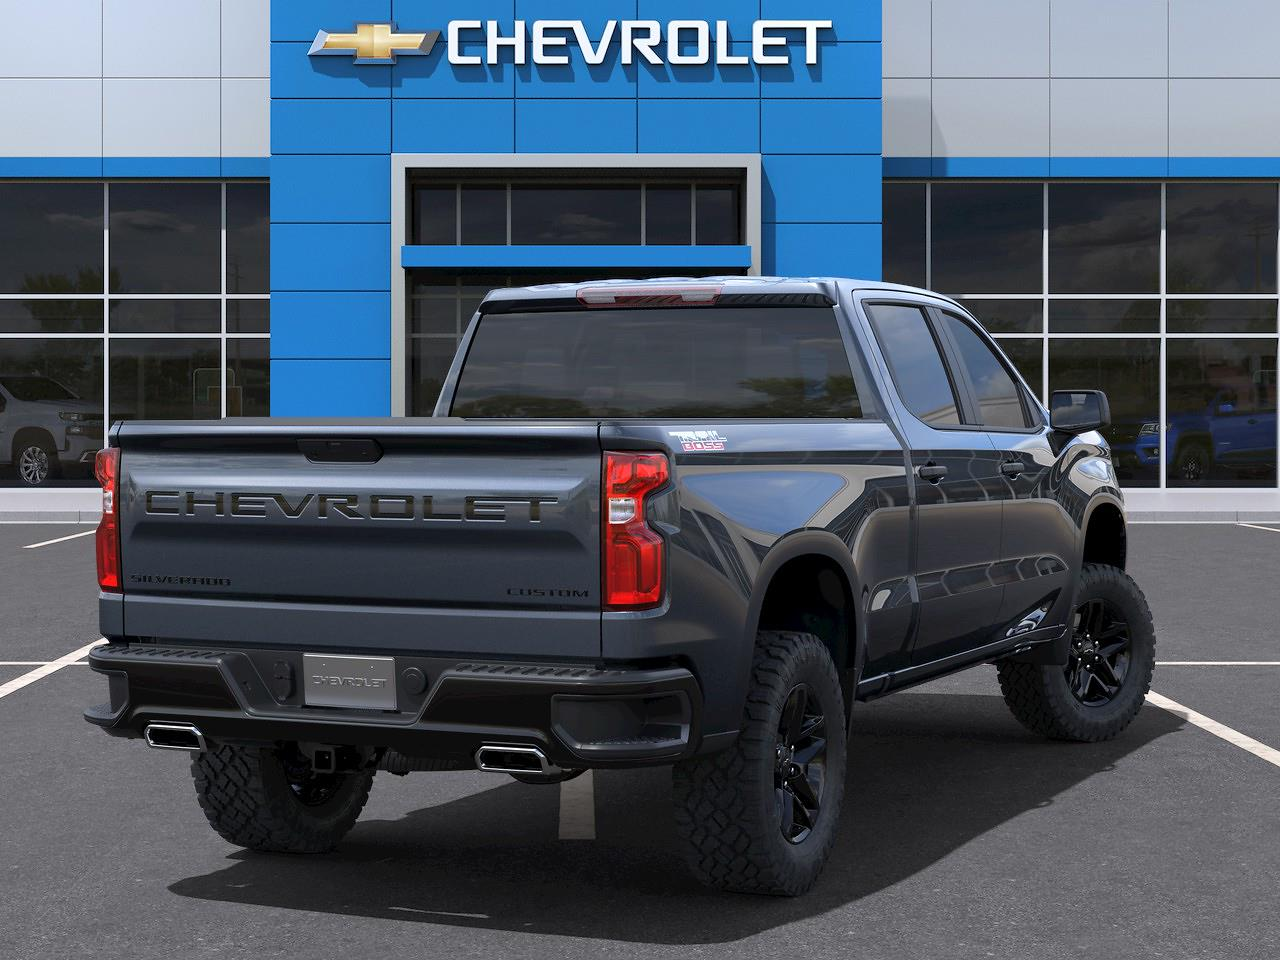 2021 Chevrolet Silverado 1500 Crew Cab 4x4, Pickup #Q210467 - photo 2